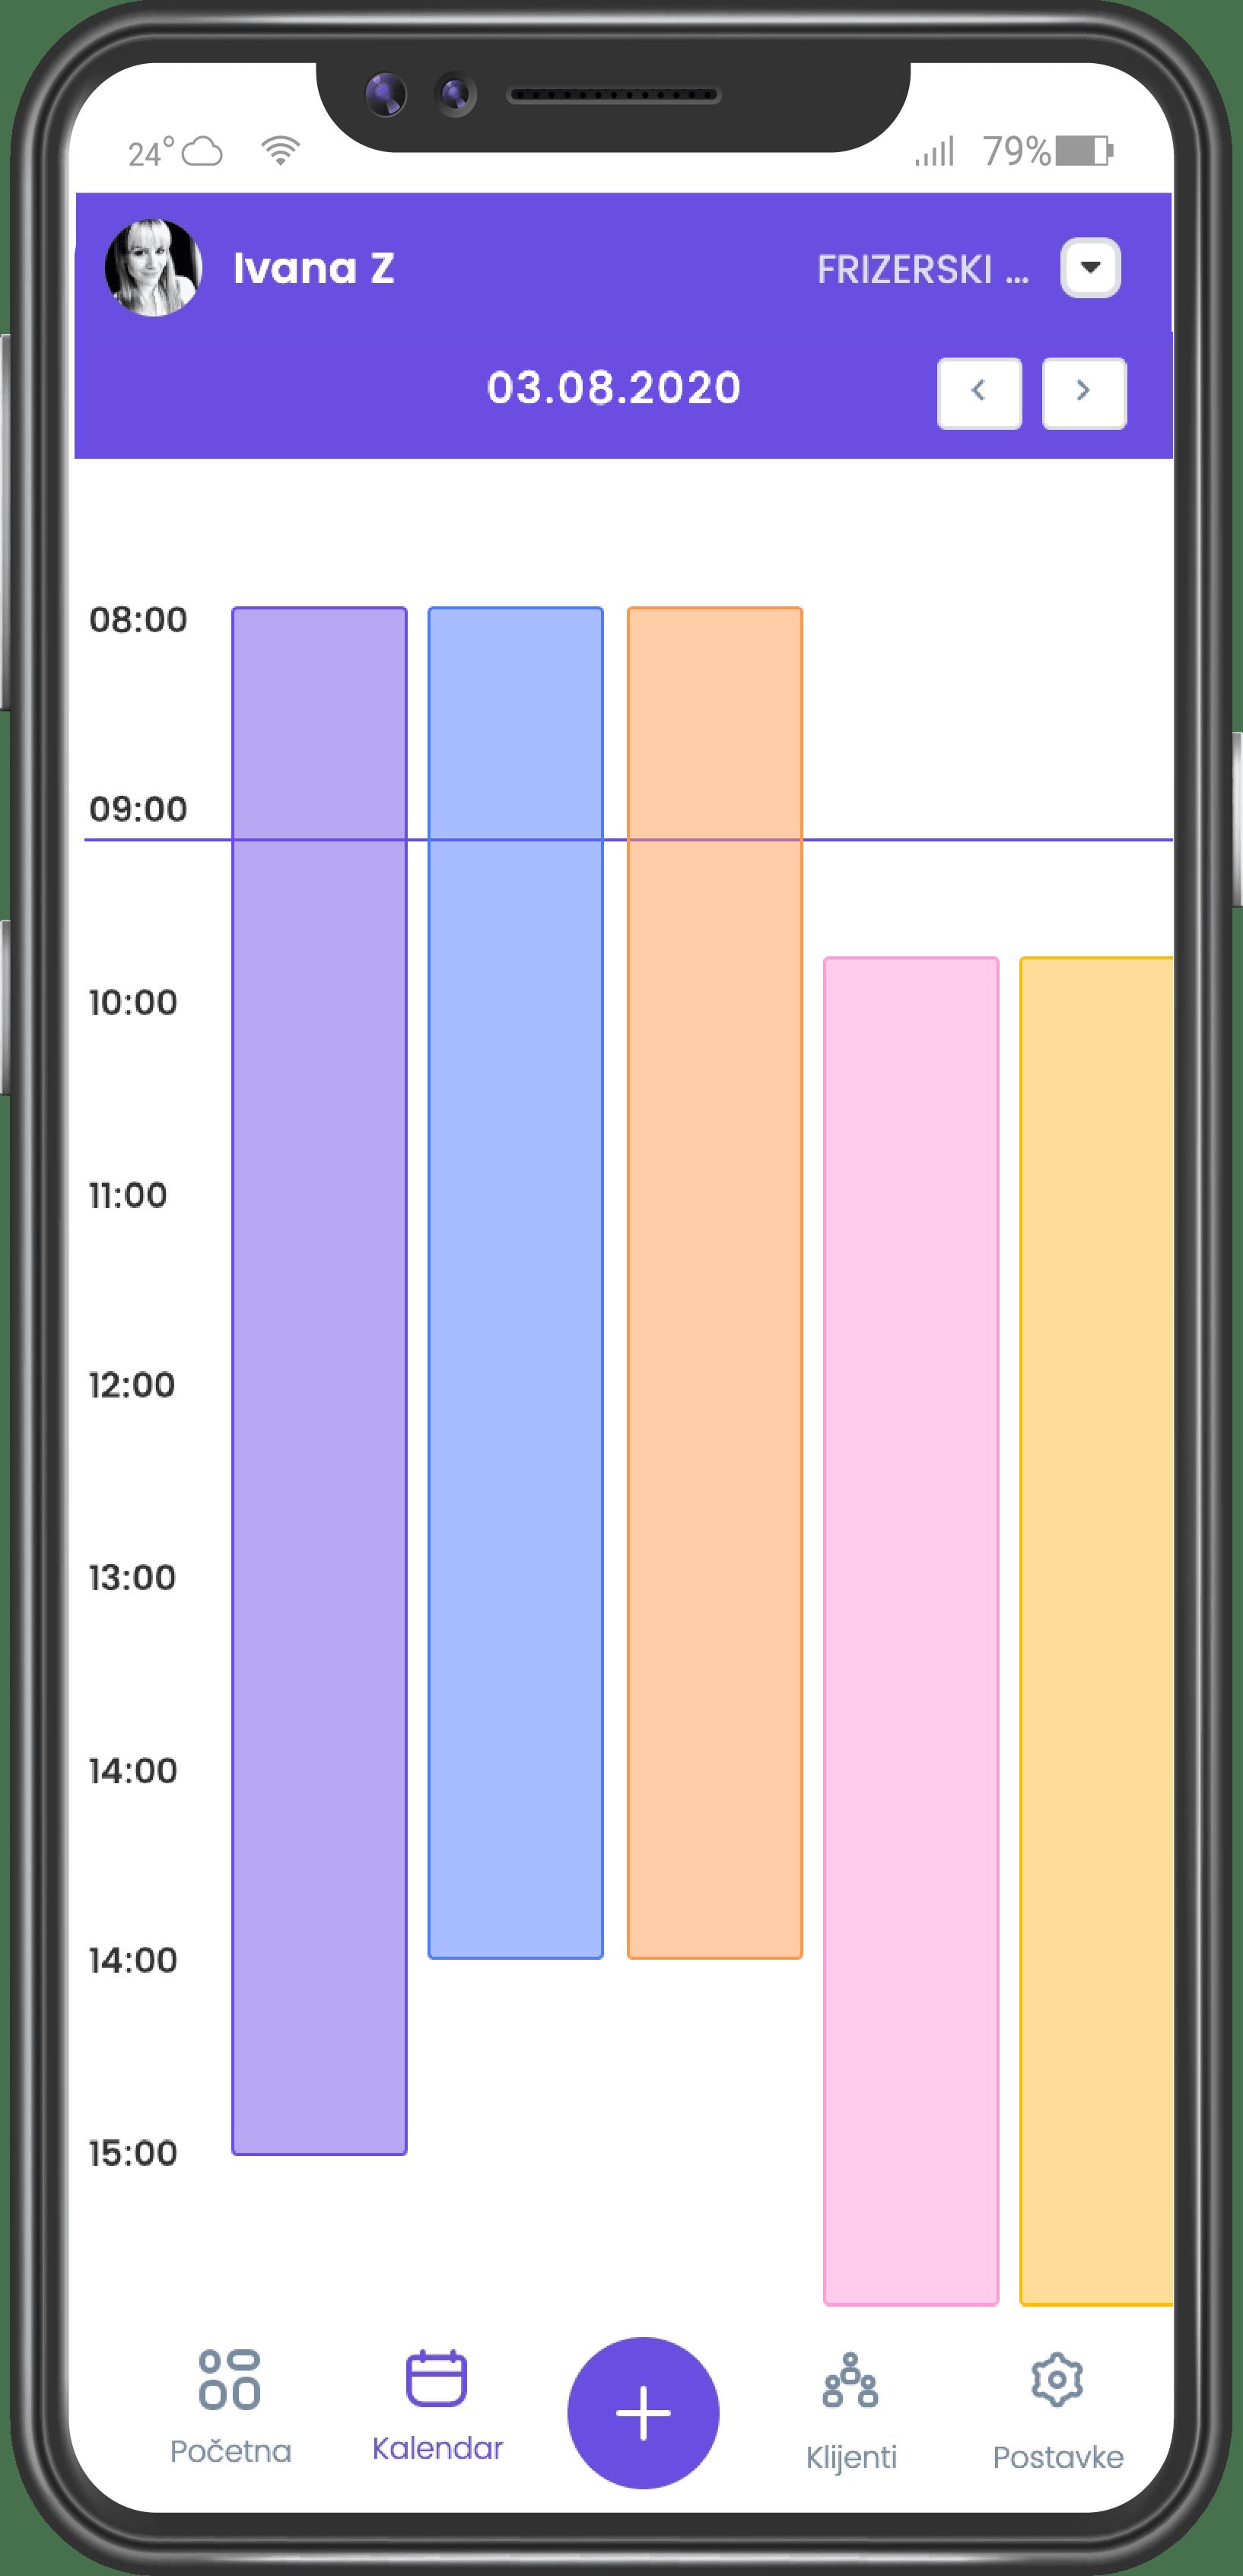 screenshot of employee week work schedule on mobile application